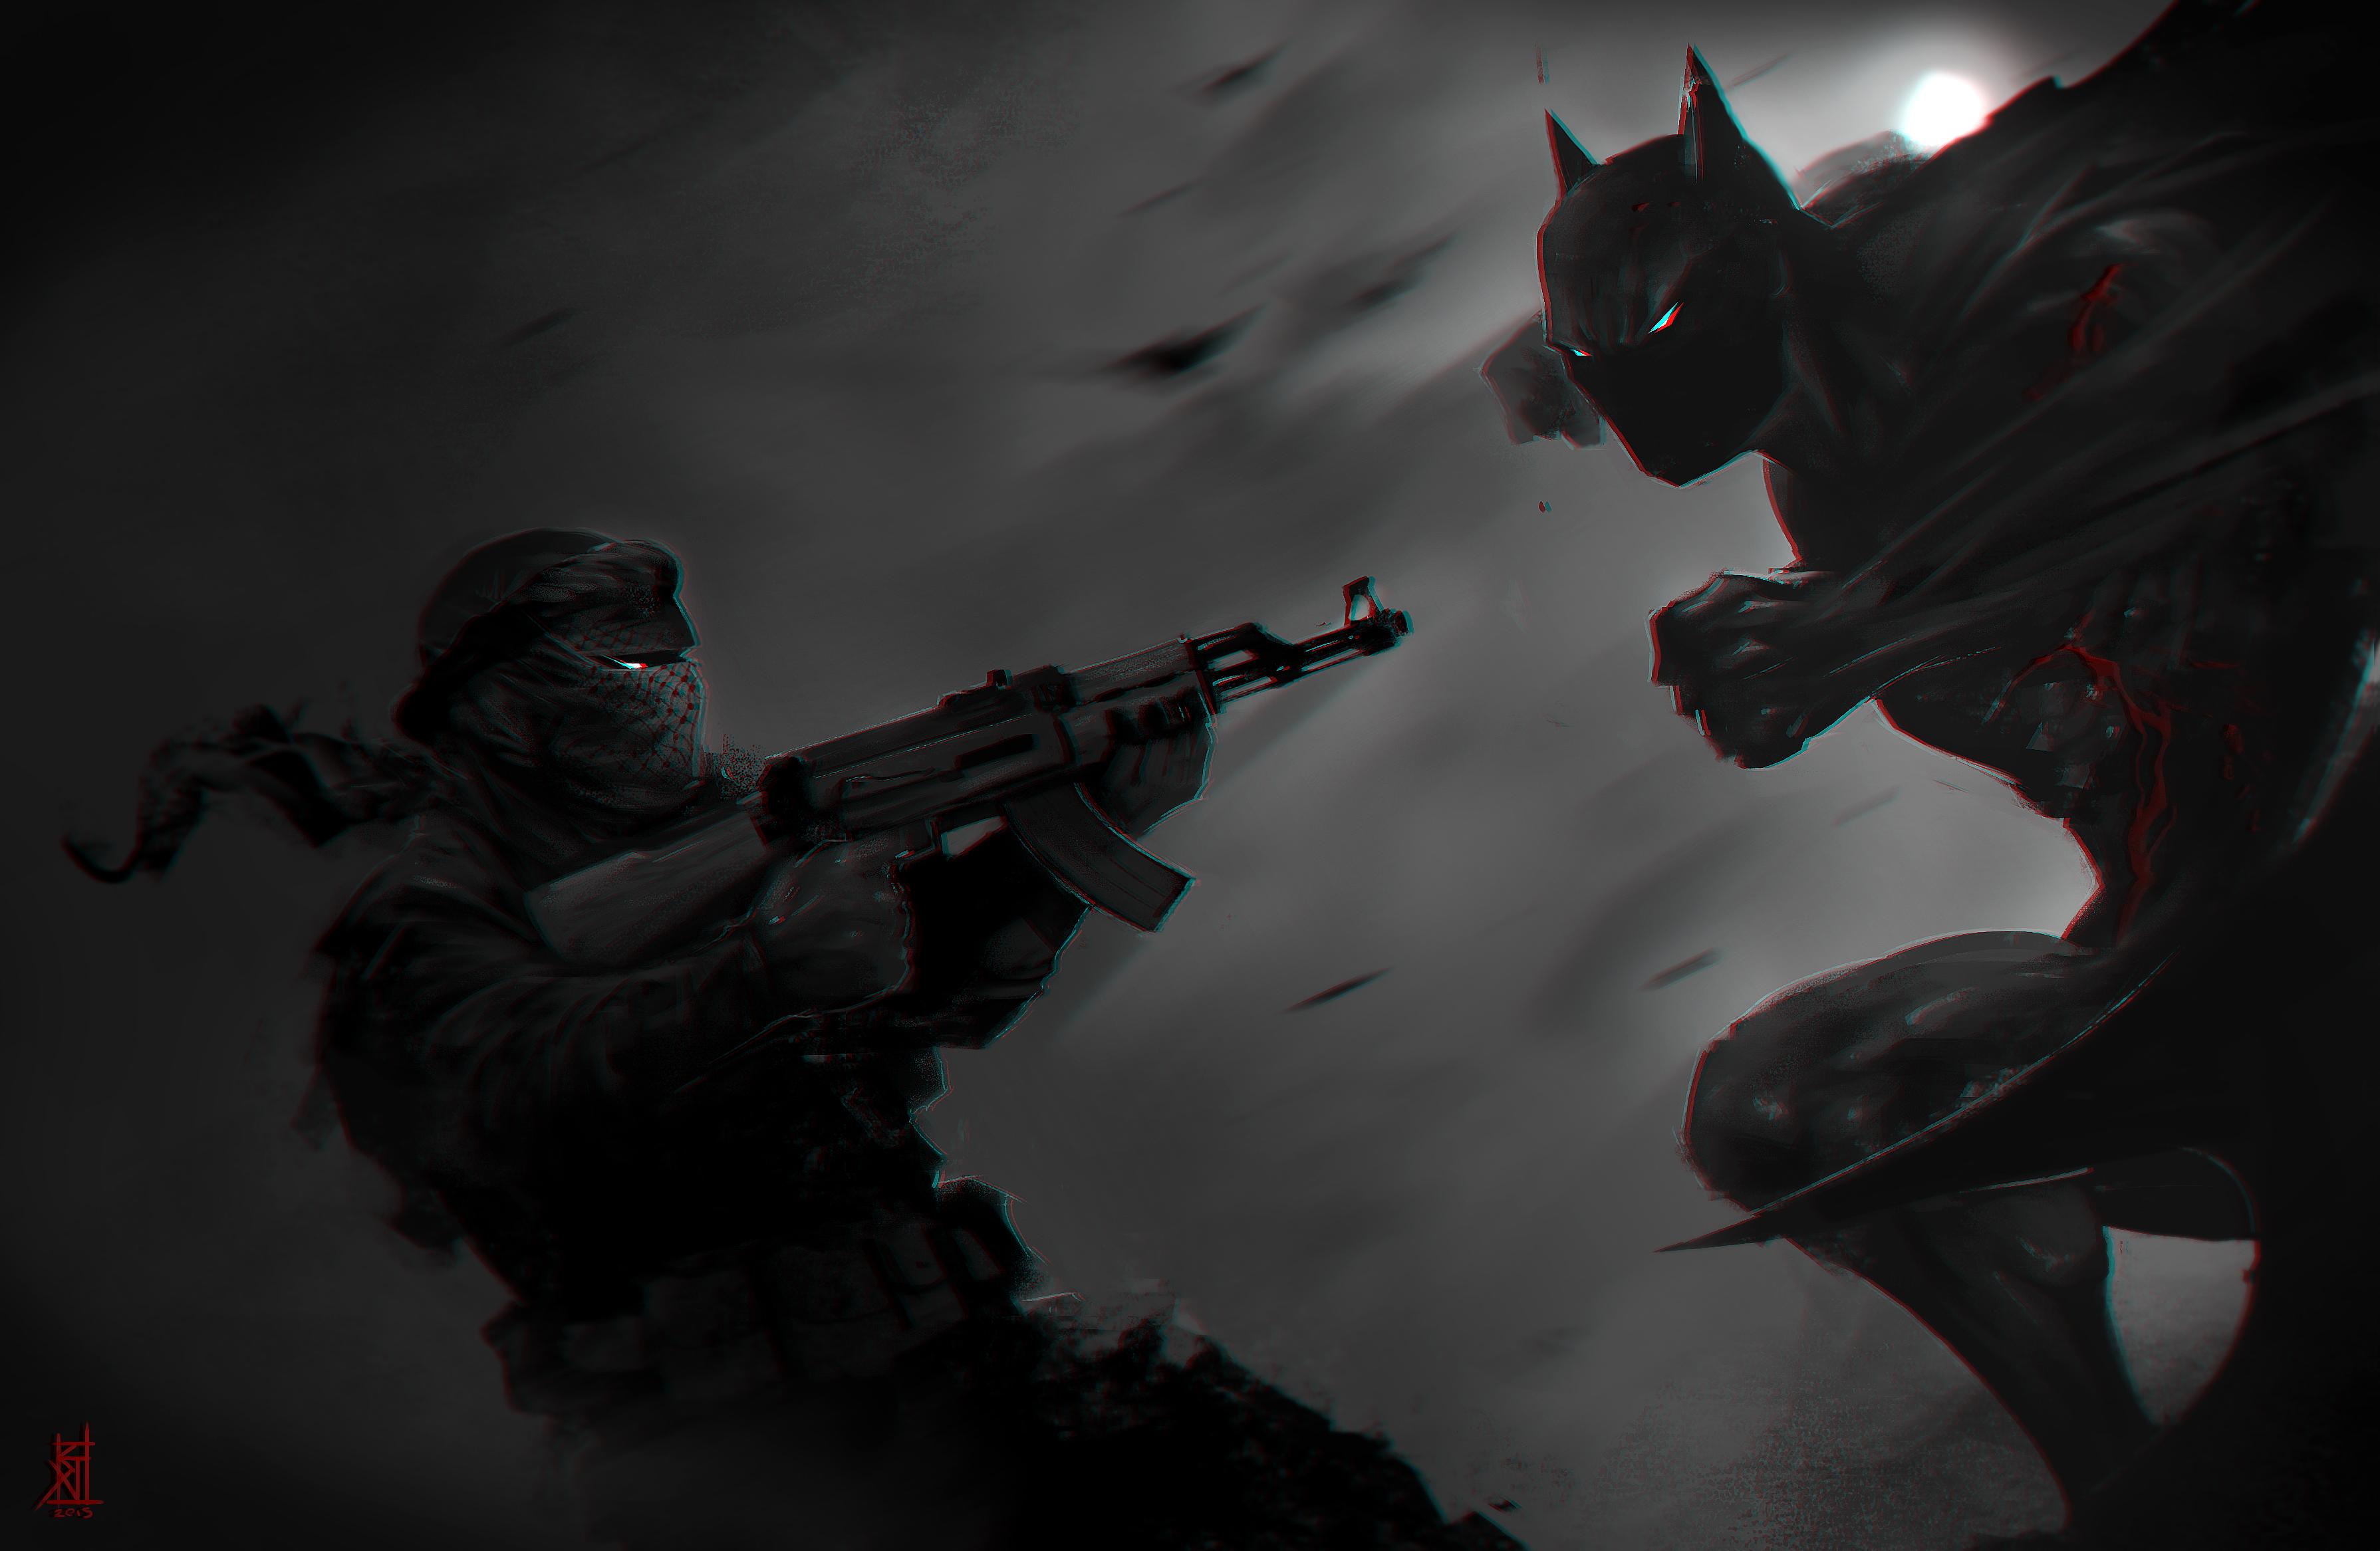 Superhero AK 47 Fight Batman Dark Soldier Assault Rifle 3579x2333